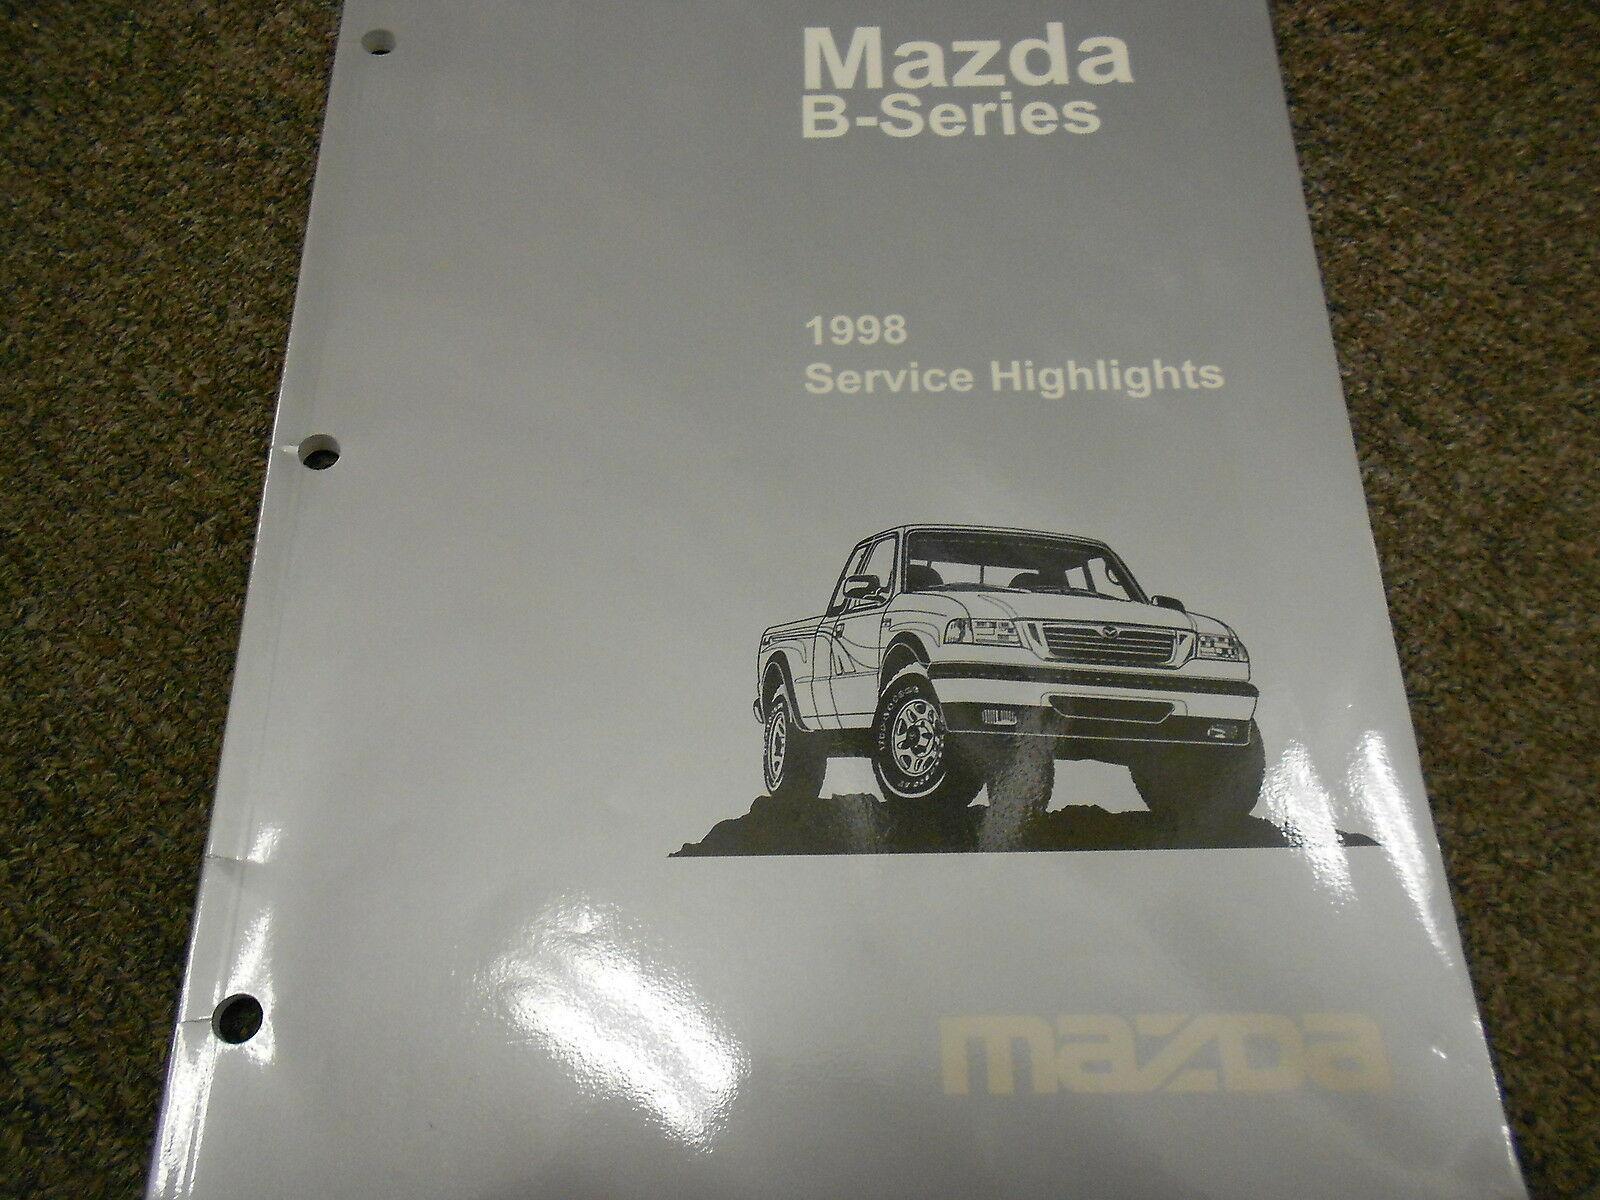 1998 Mazda B-Serie Truck Service Highlights Reparatur Shop Manuell Silber